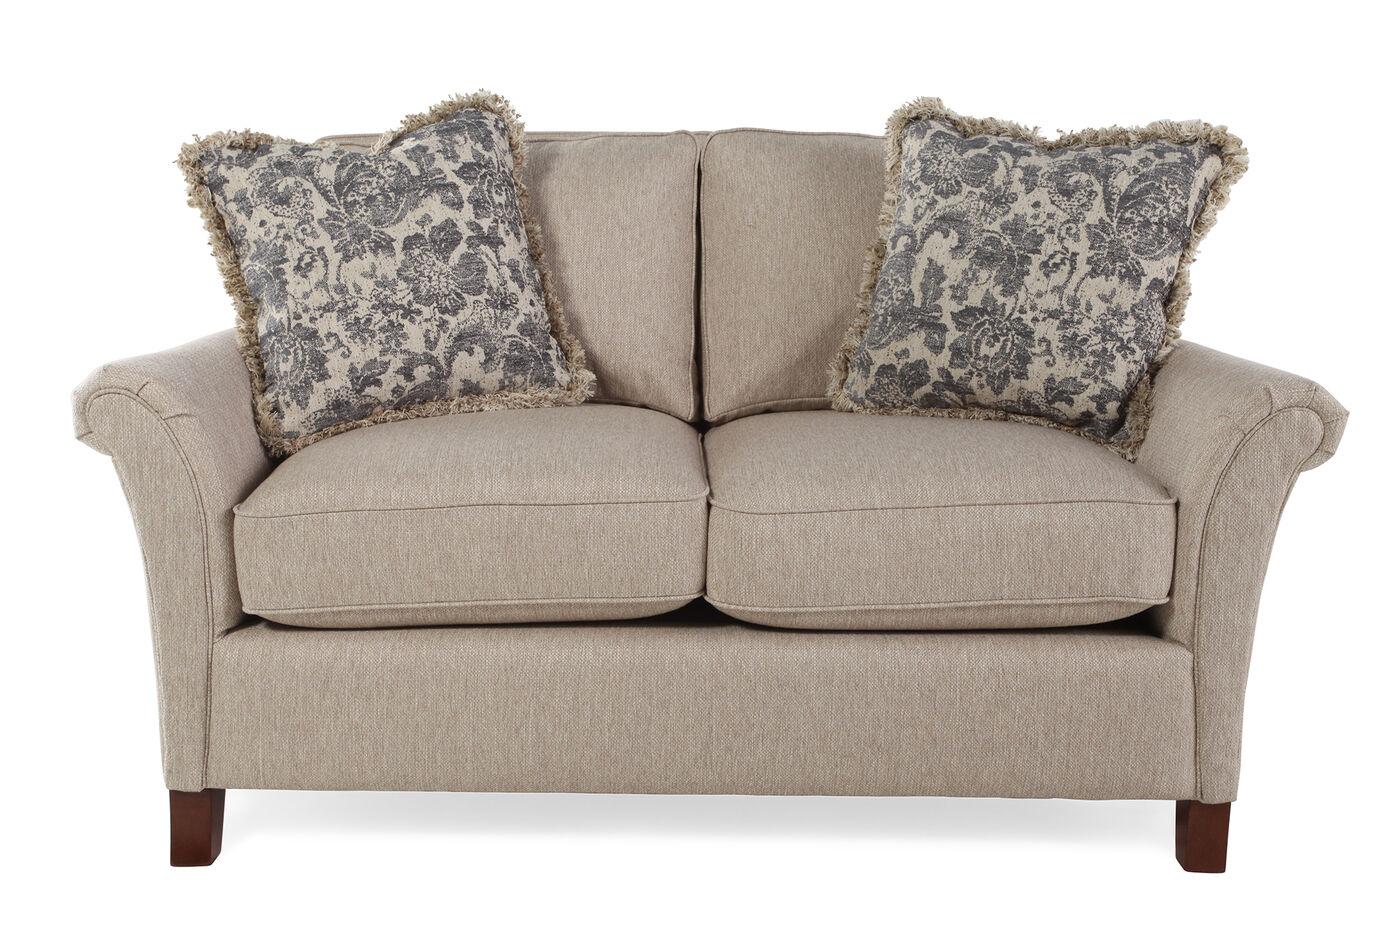 La Z Boy Sofas And Loveseats La Z Boy Leighton Sandstone Sofa Mathis Brothers Furniture Thesofa